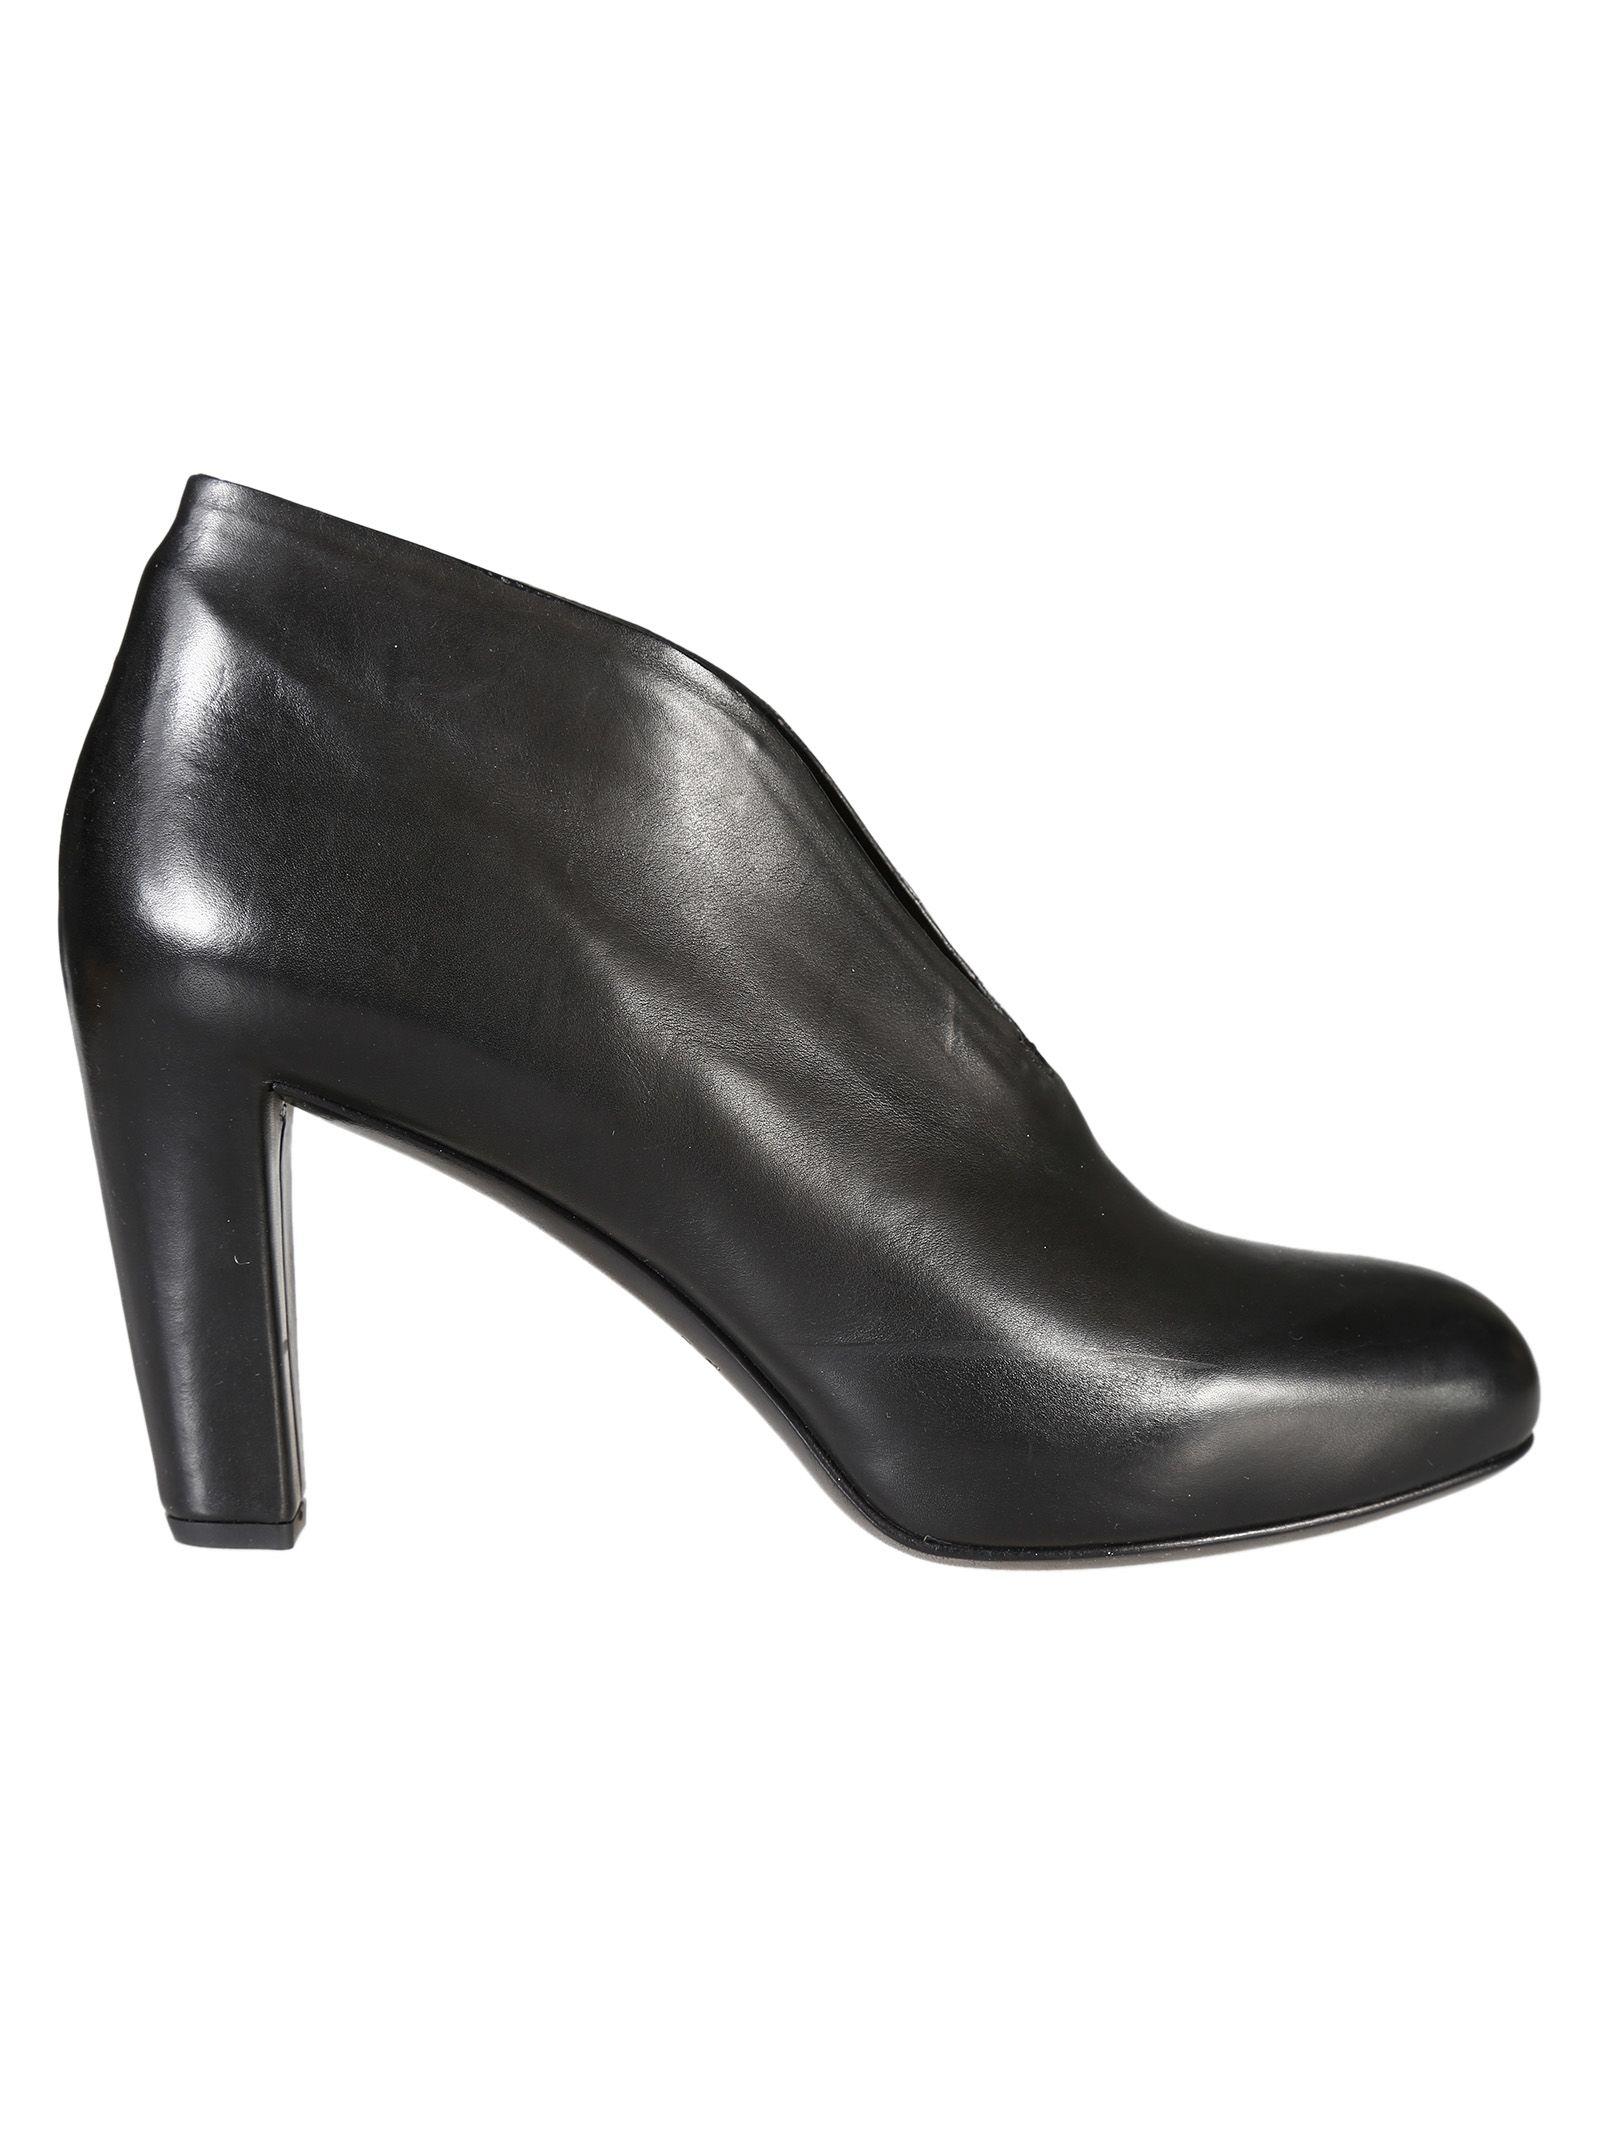 Choice For Sale Classic ROBERTO DEL CARLO High-heeled Shoe Perfect gRmnamM